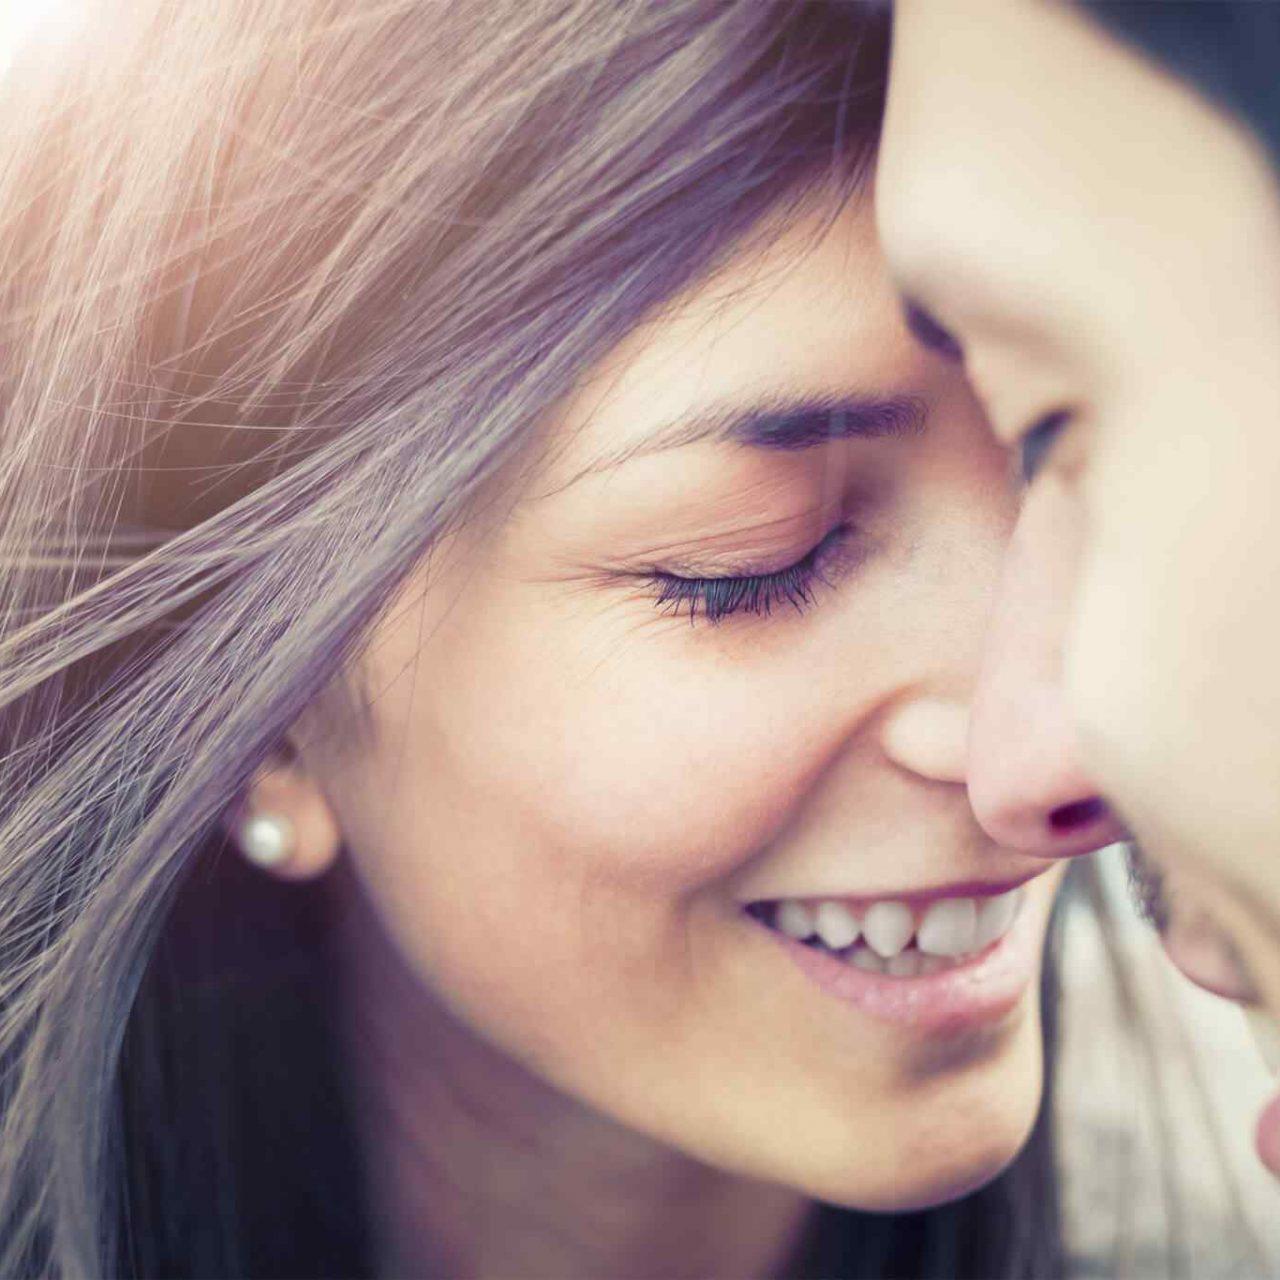 https://kimlevincoaching.com/wp-content/uploads/2018/01/img-class-marriage-01-1280x1280.jpg